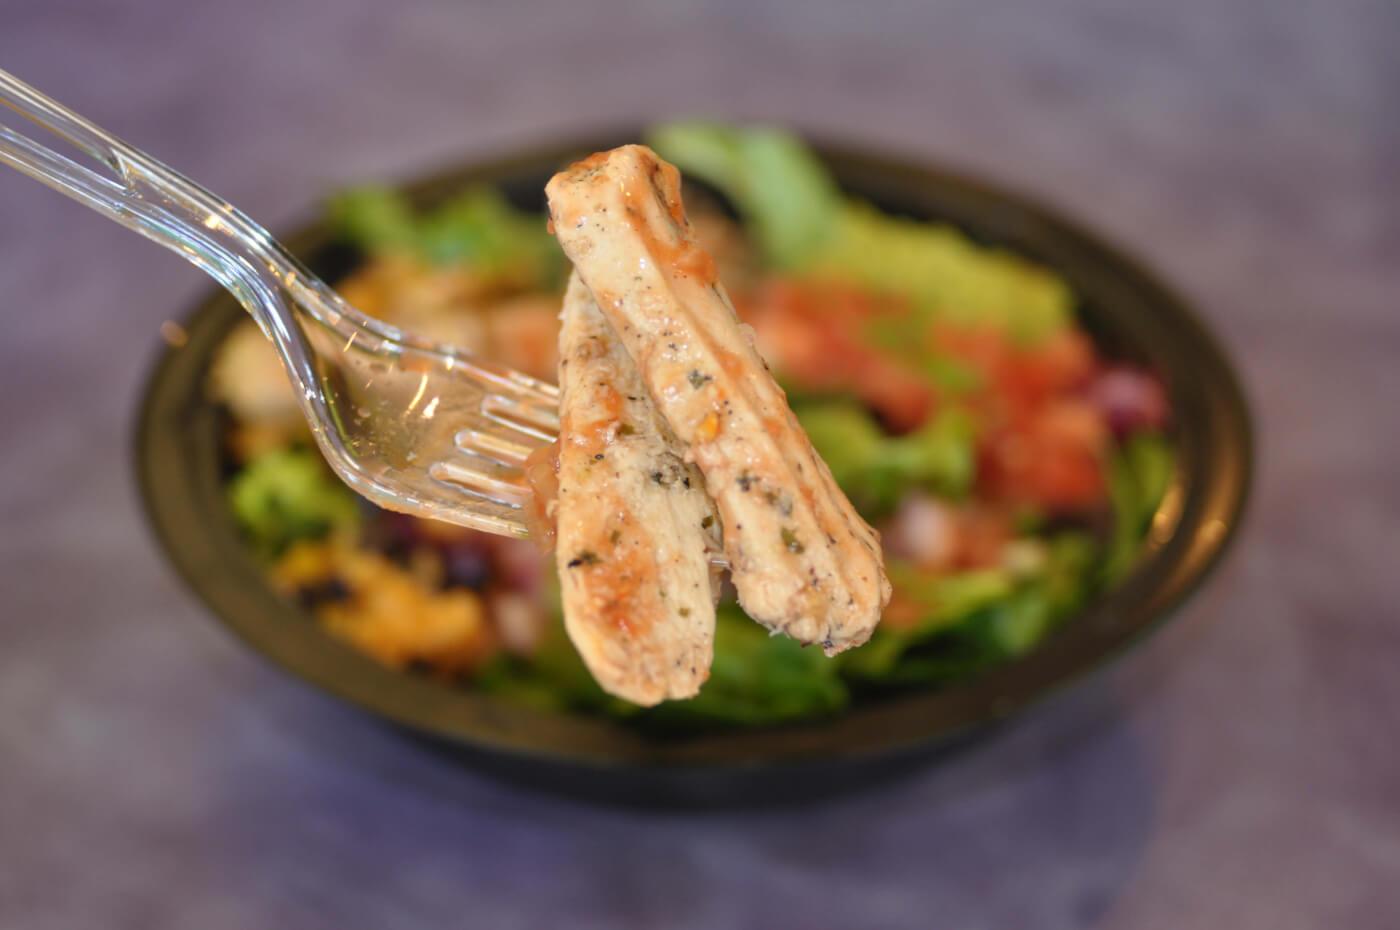 Tropical Smoothie Cafe Chicken Caesar Salad